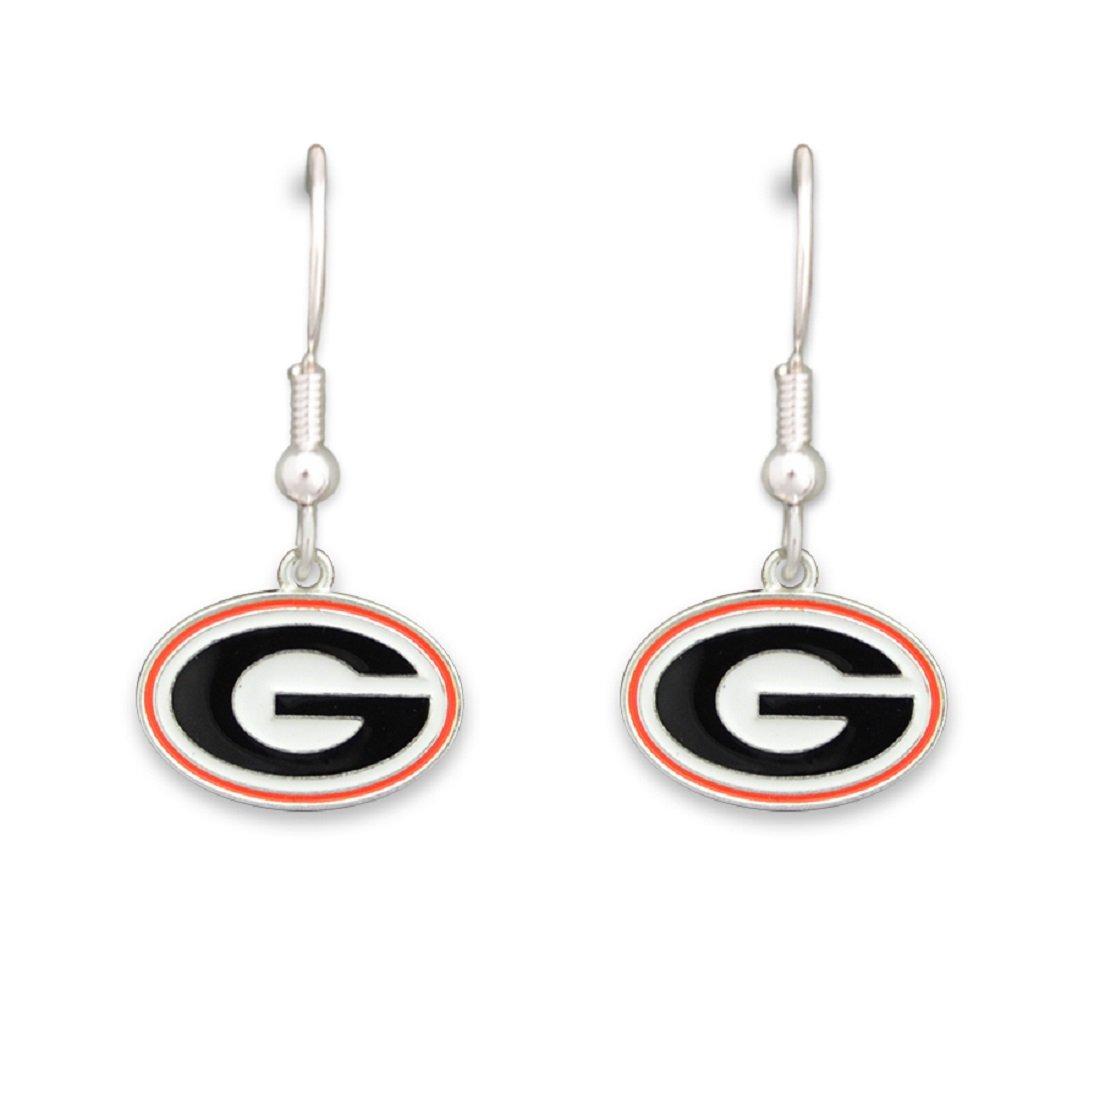 FTH Silver Tone Fishhook Earrings with an Iridescent Georgia Bulldogs Charm